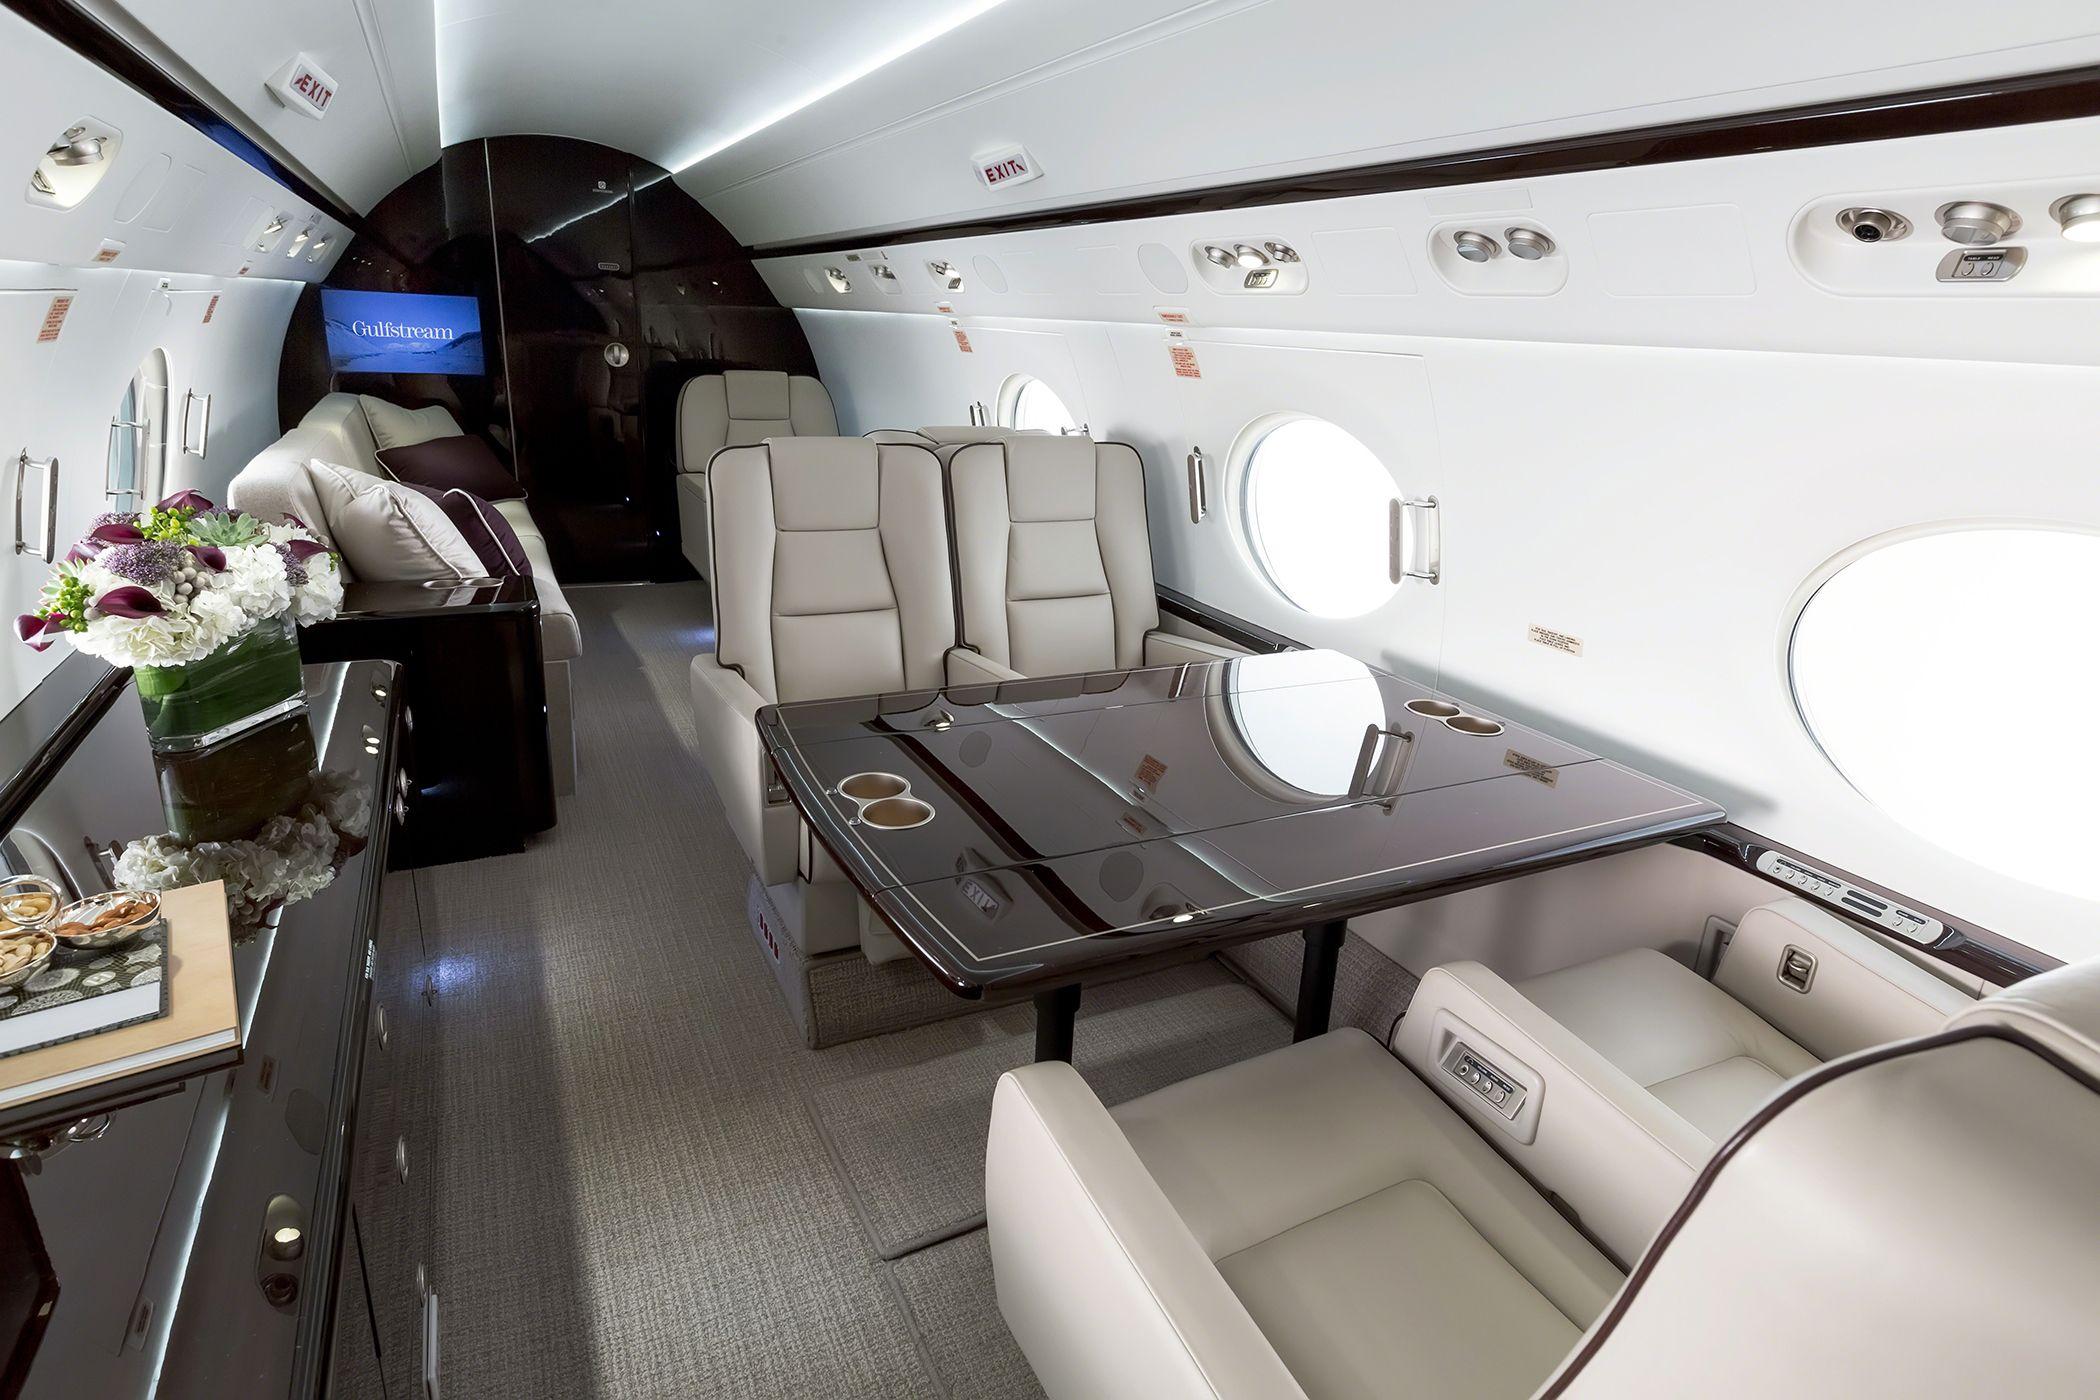 Step Inside The Gulfstream G550 Luxury Jets Private Jet Jet